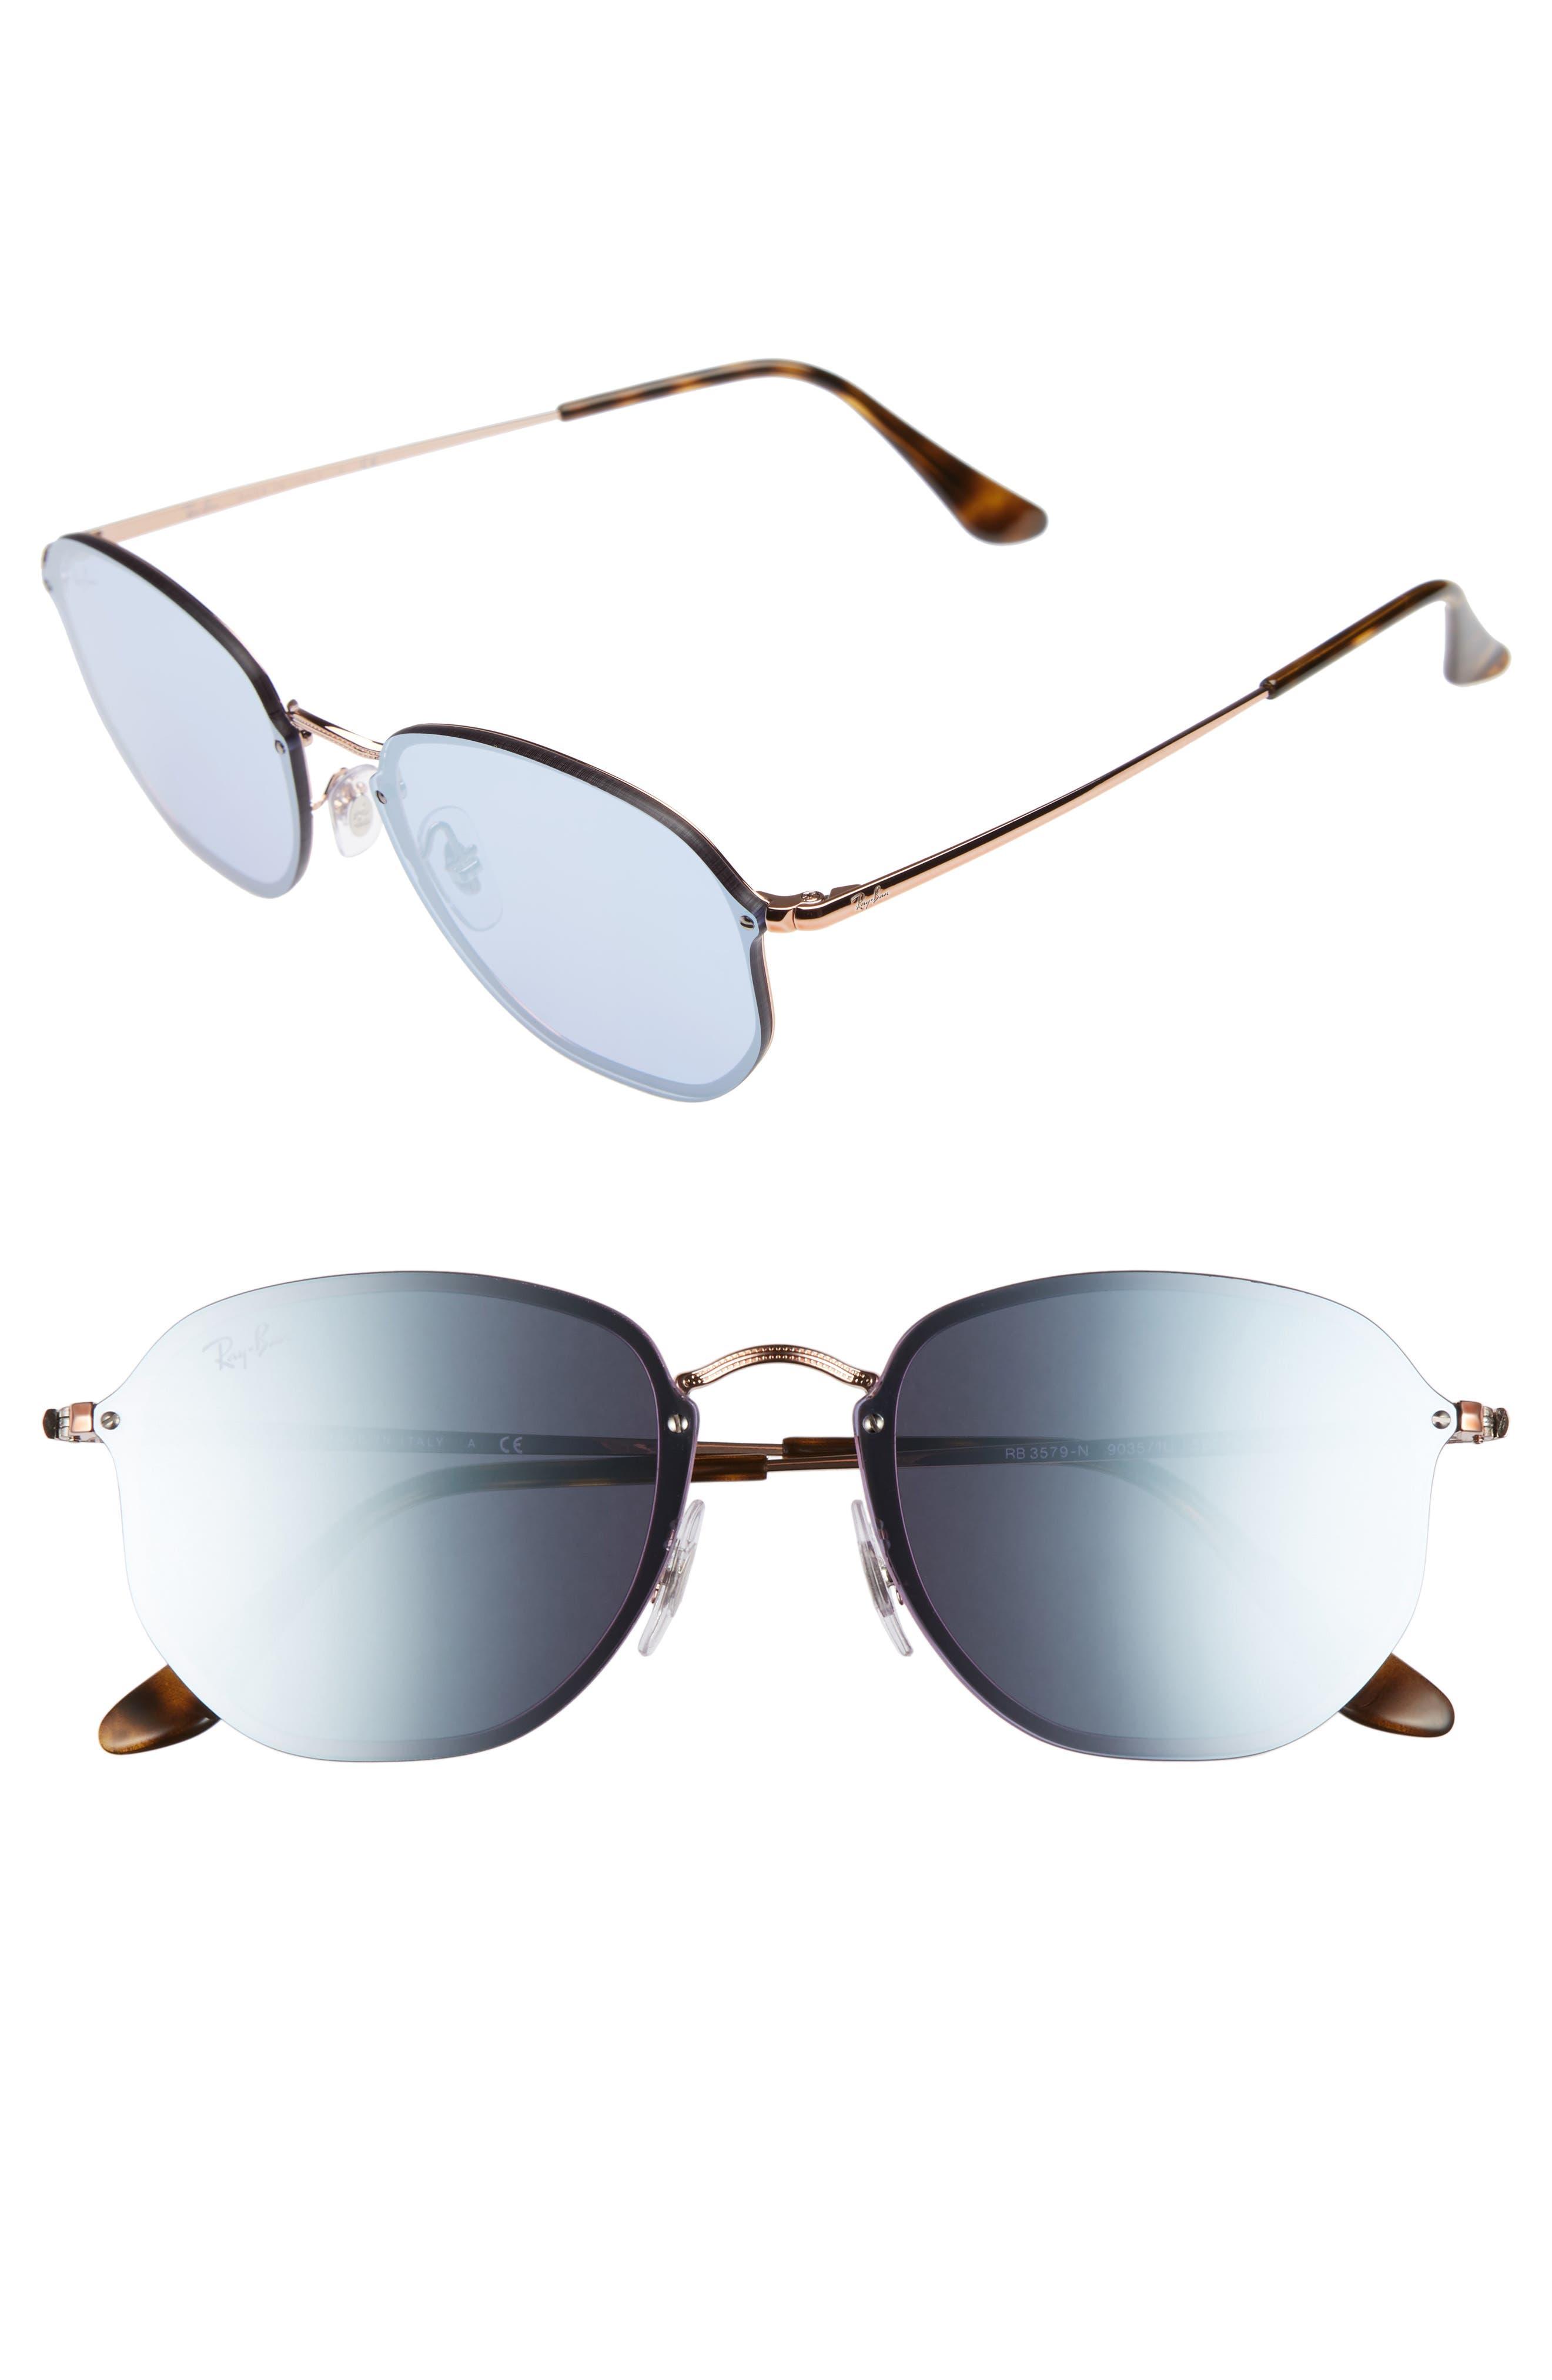 Ray-Ban Rimless 58mm Sunglasses